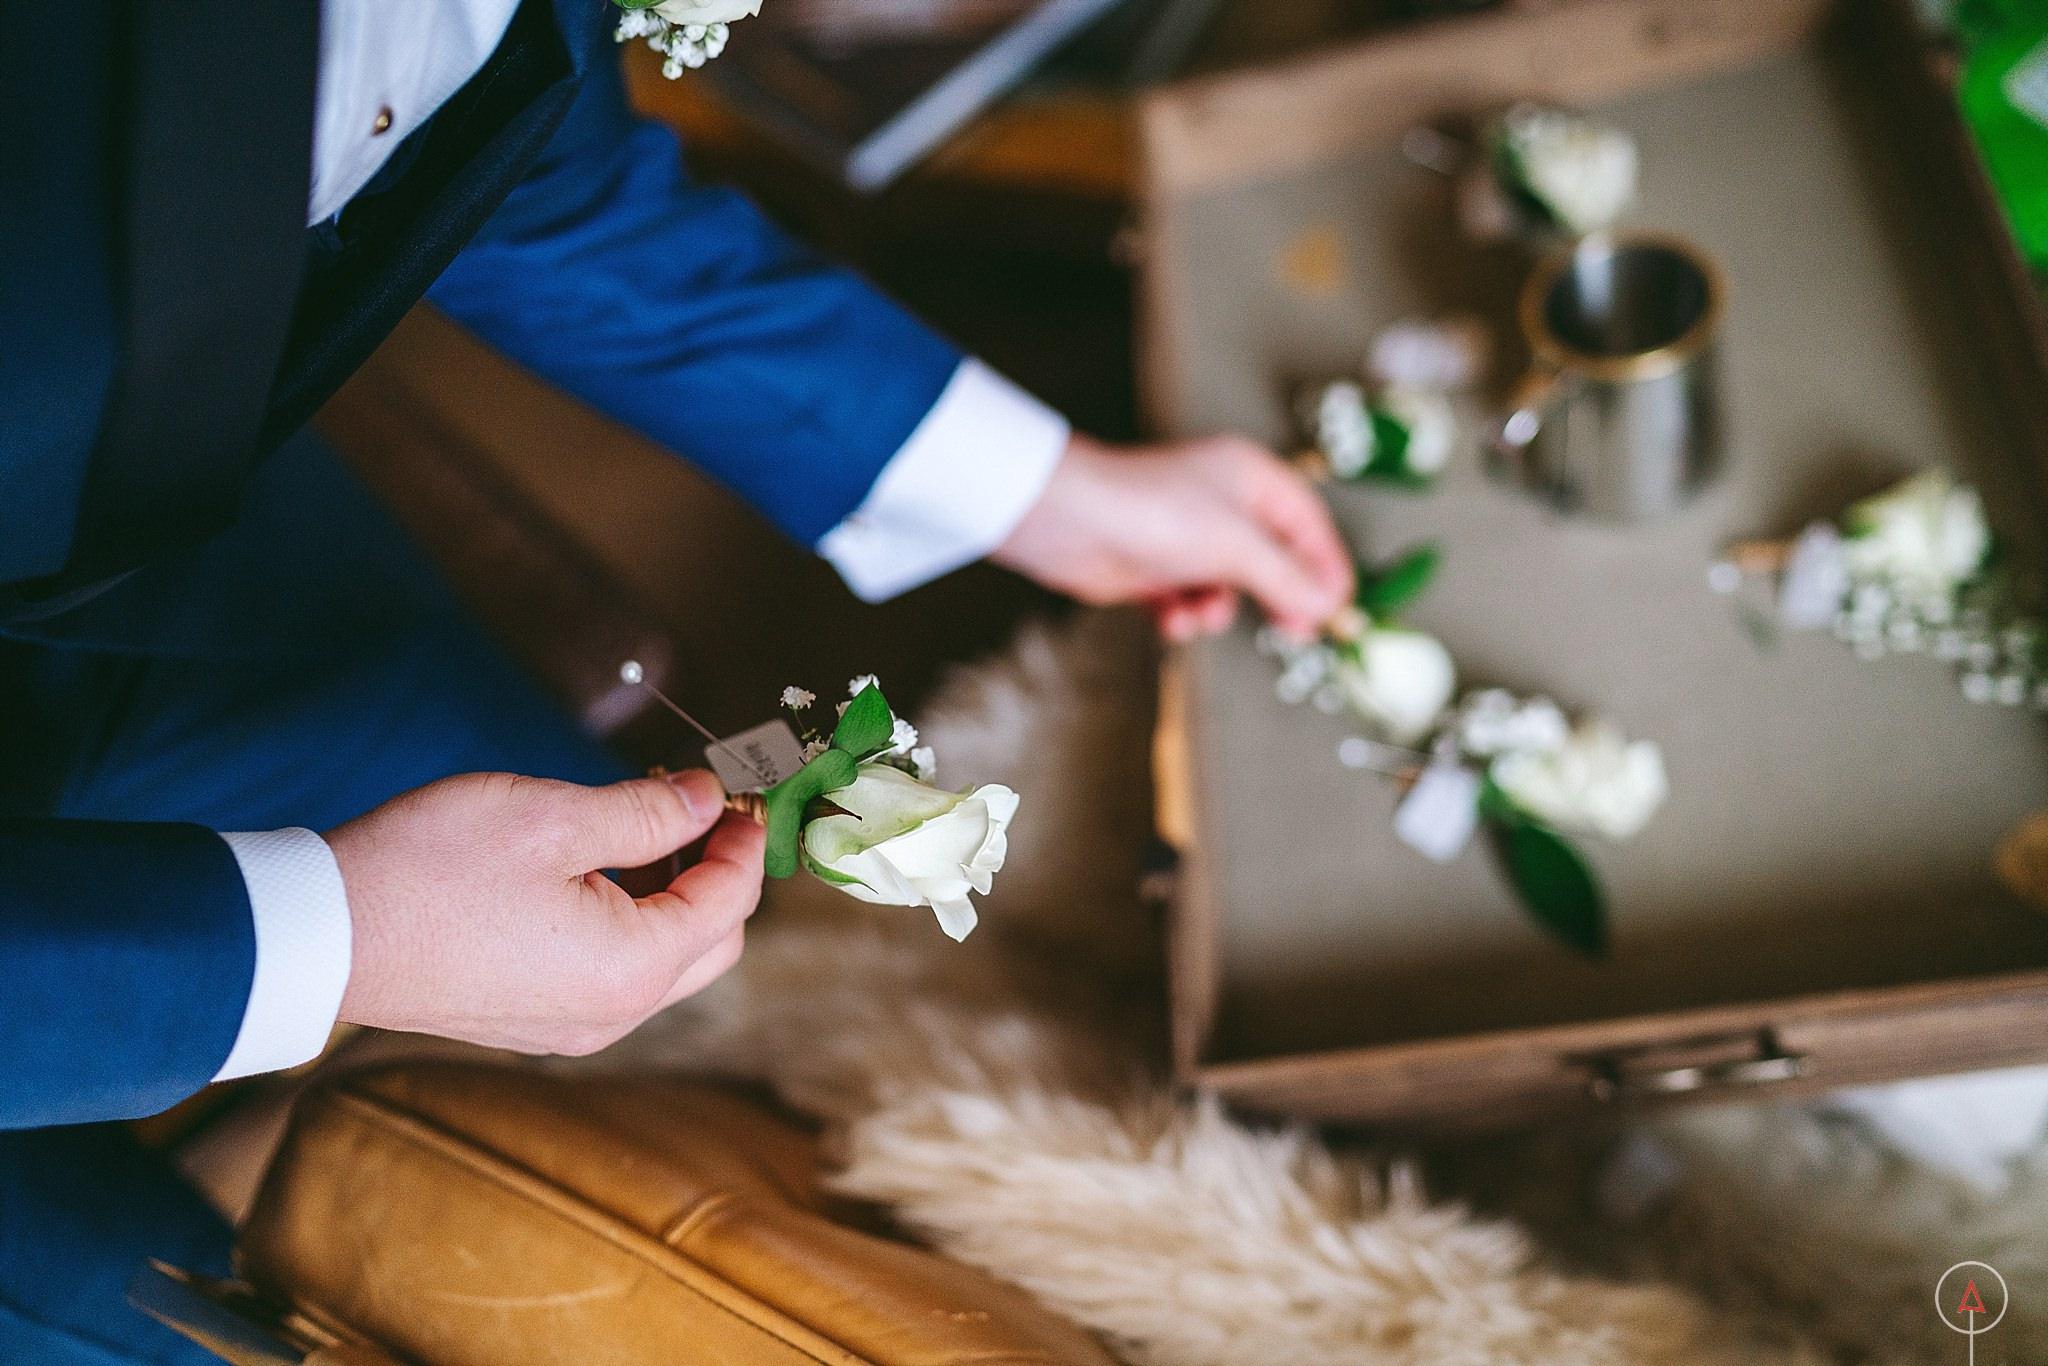 cardiff-wedding-photographer-aga-tomaszek_0229